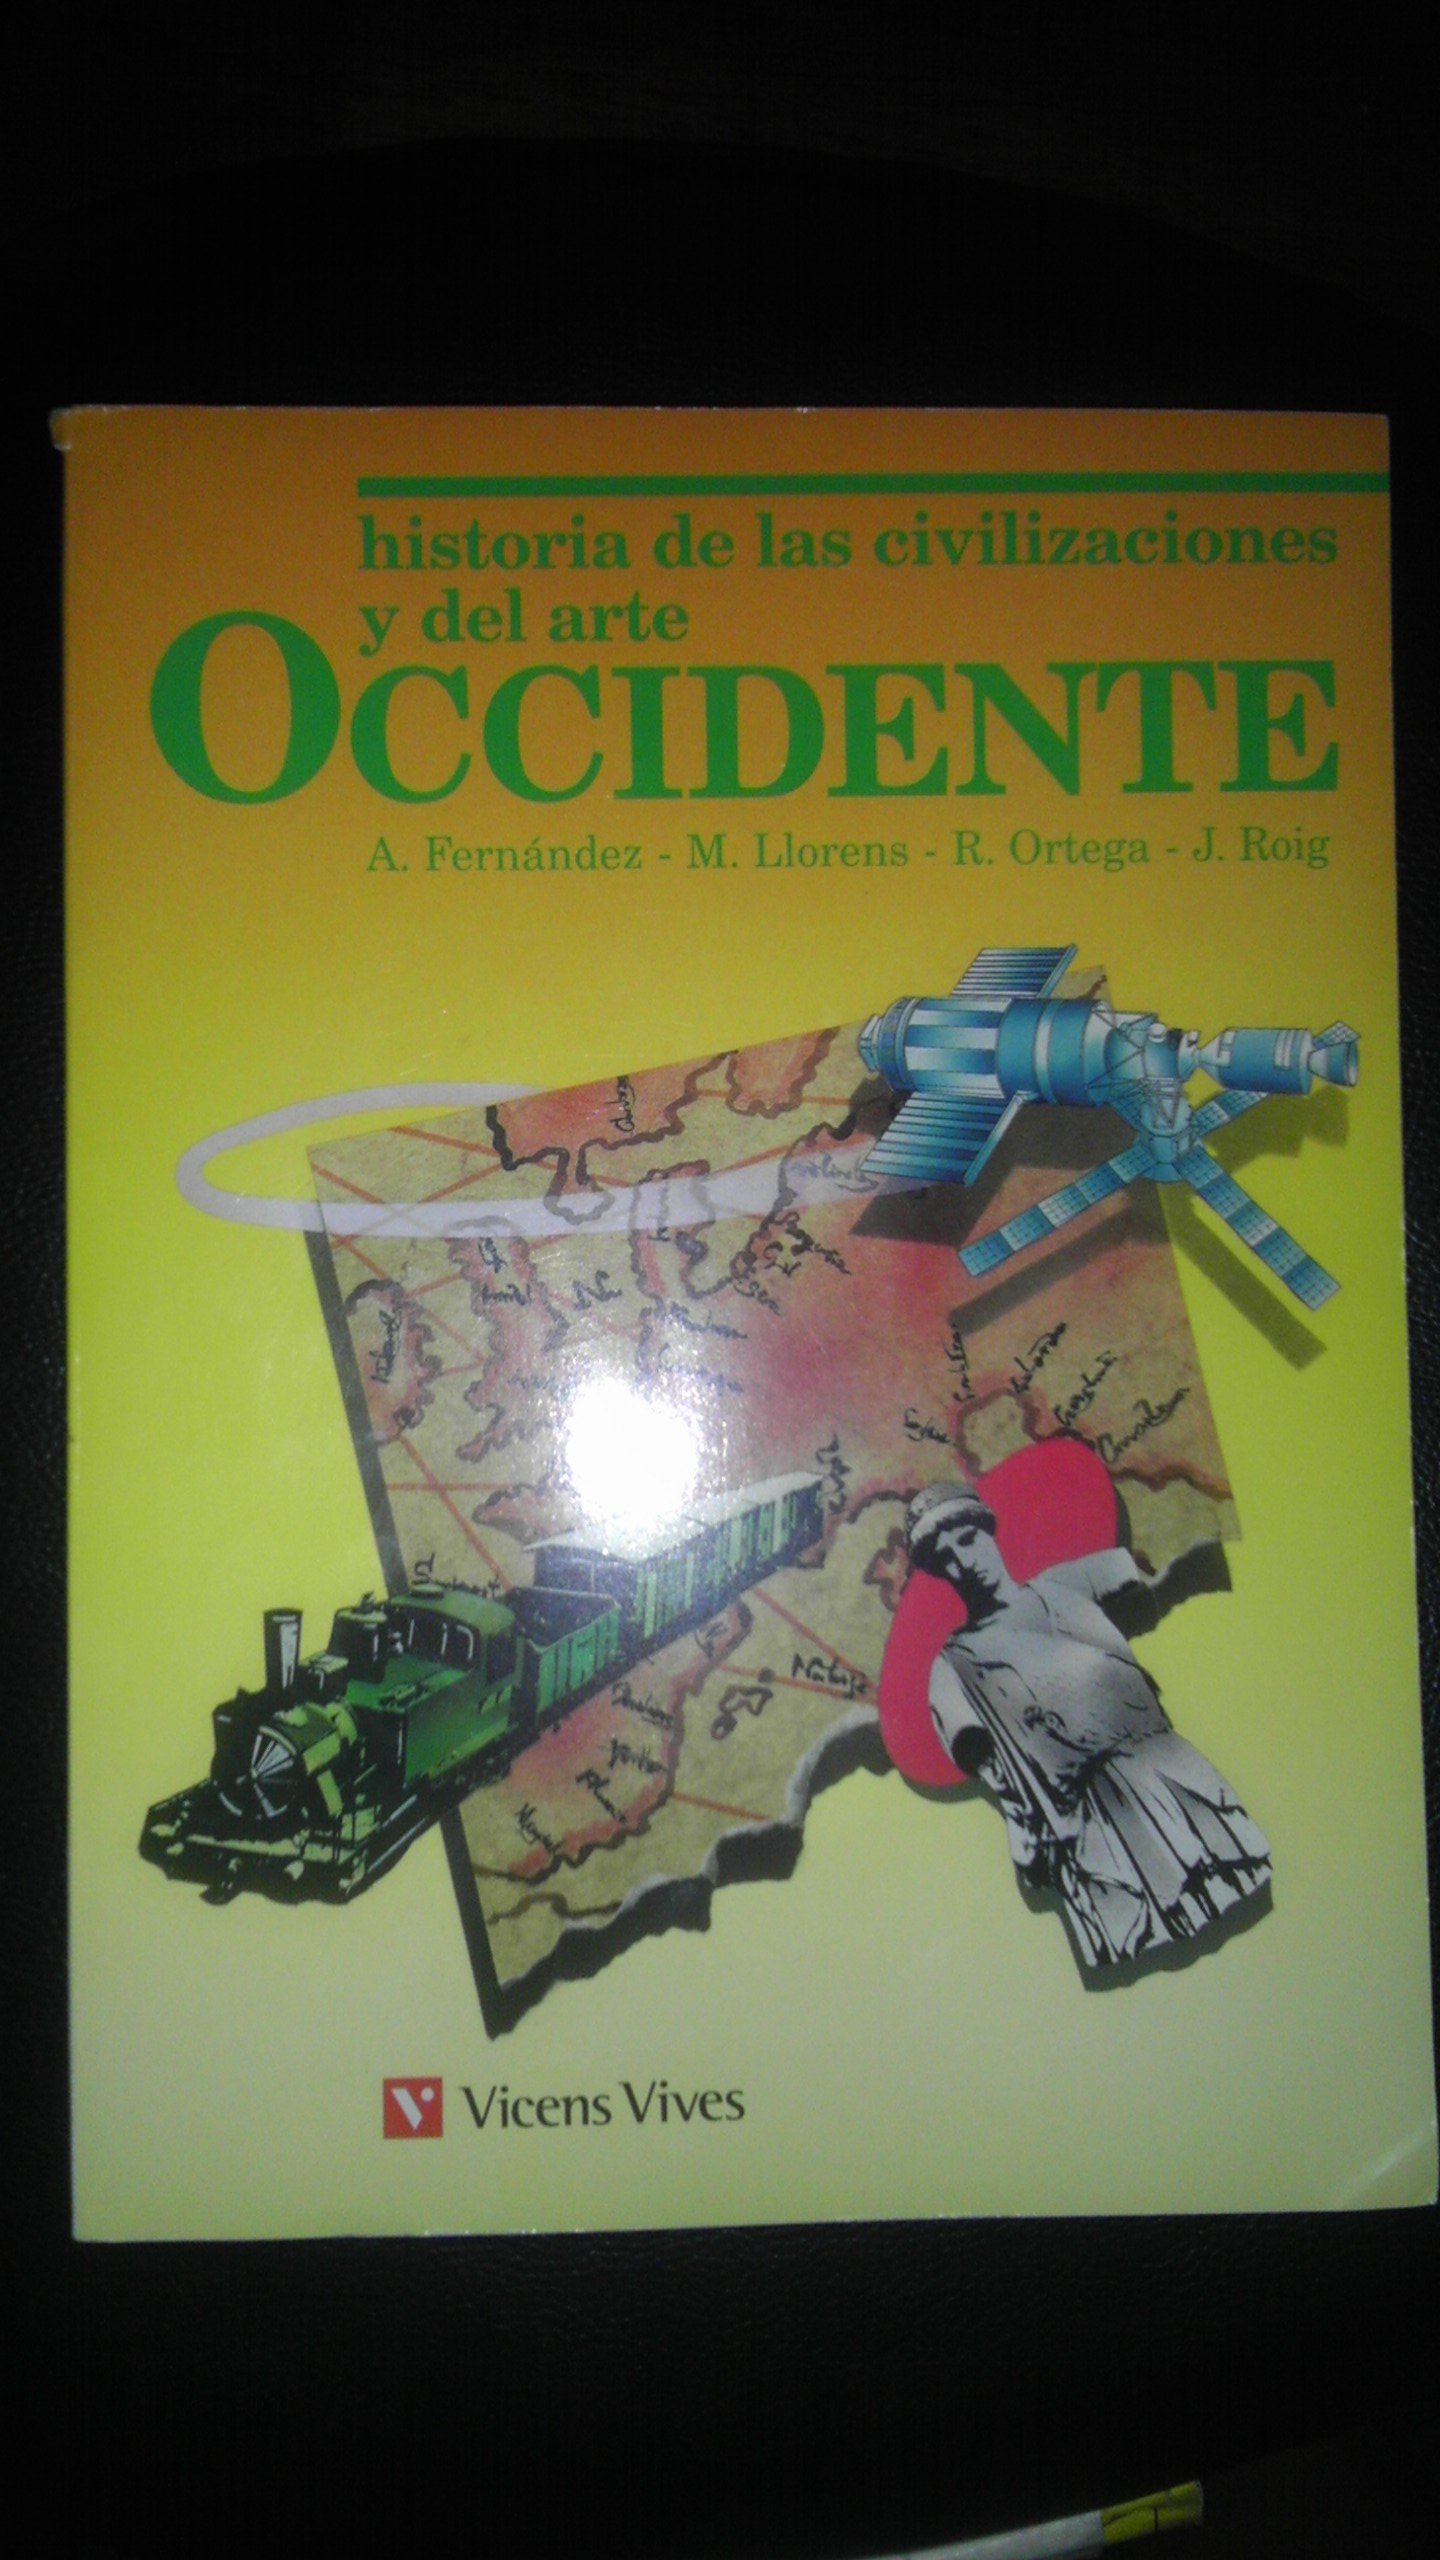 Occidente - 9788431668556: Amazon.es: Fernandez, Llorens, Ortega, Roig: Libros